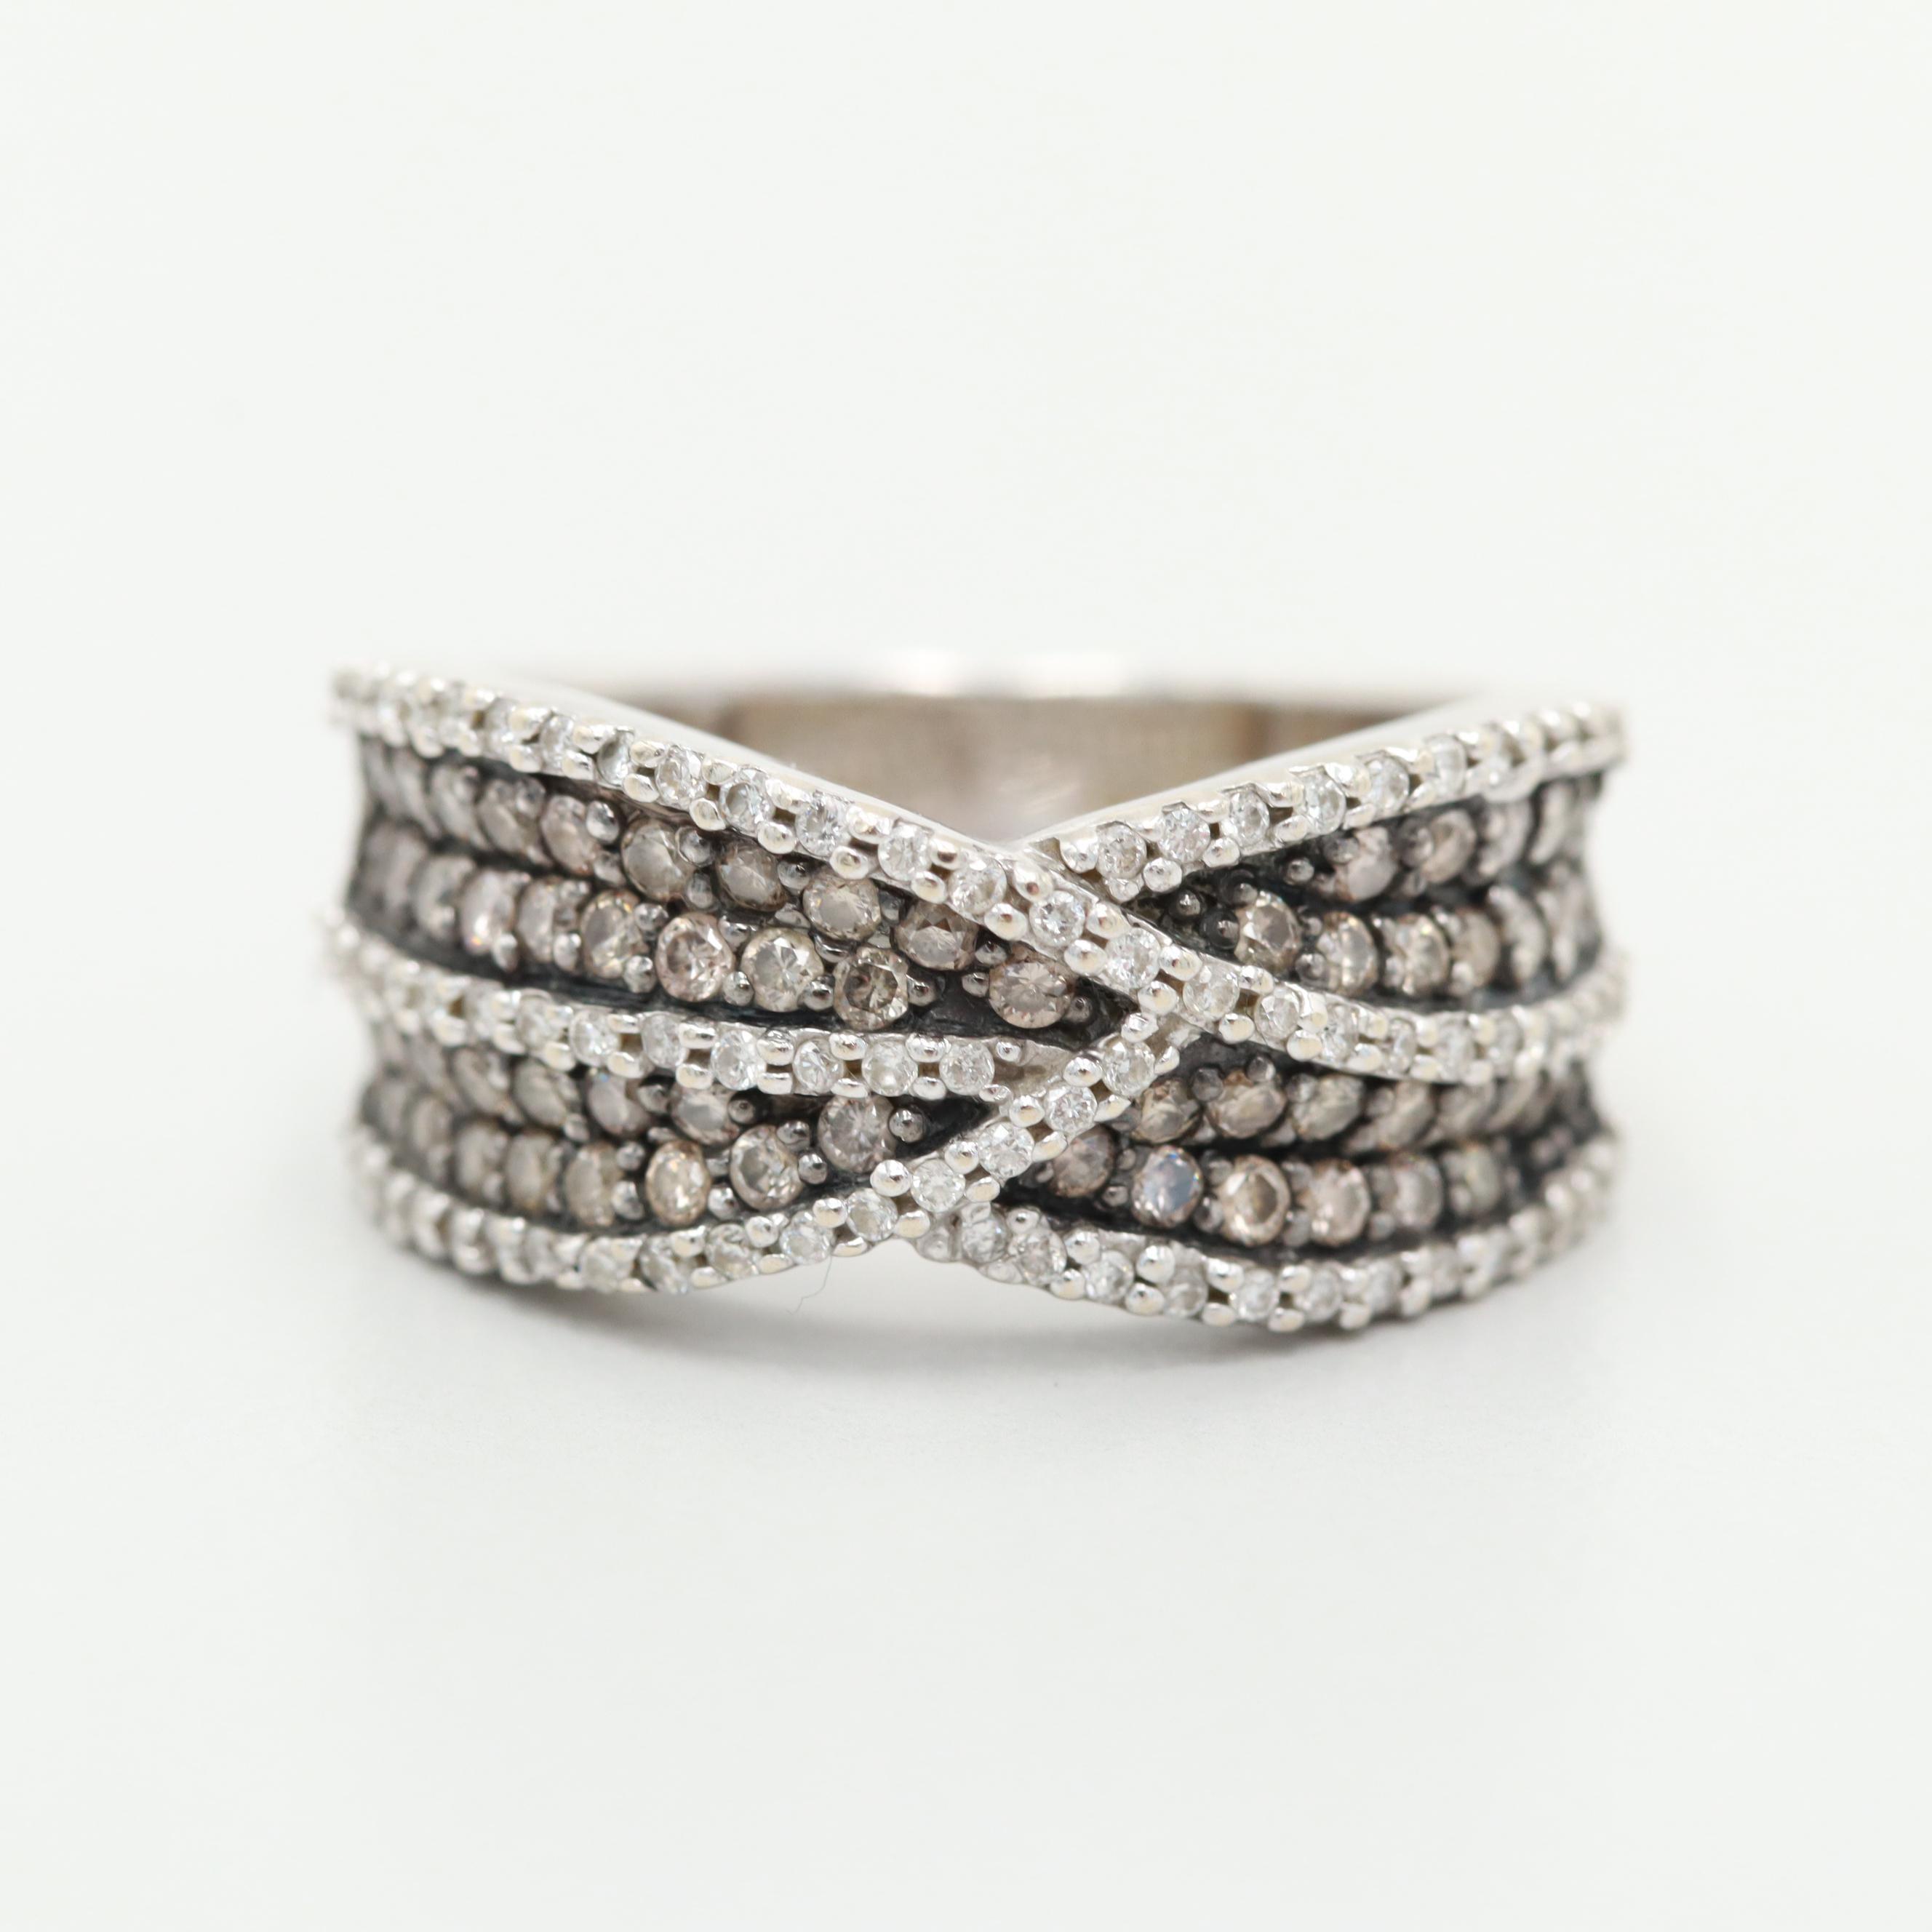 Le Vian 14K Yellow Gold Diamond Ring